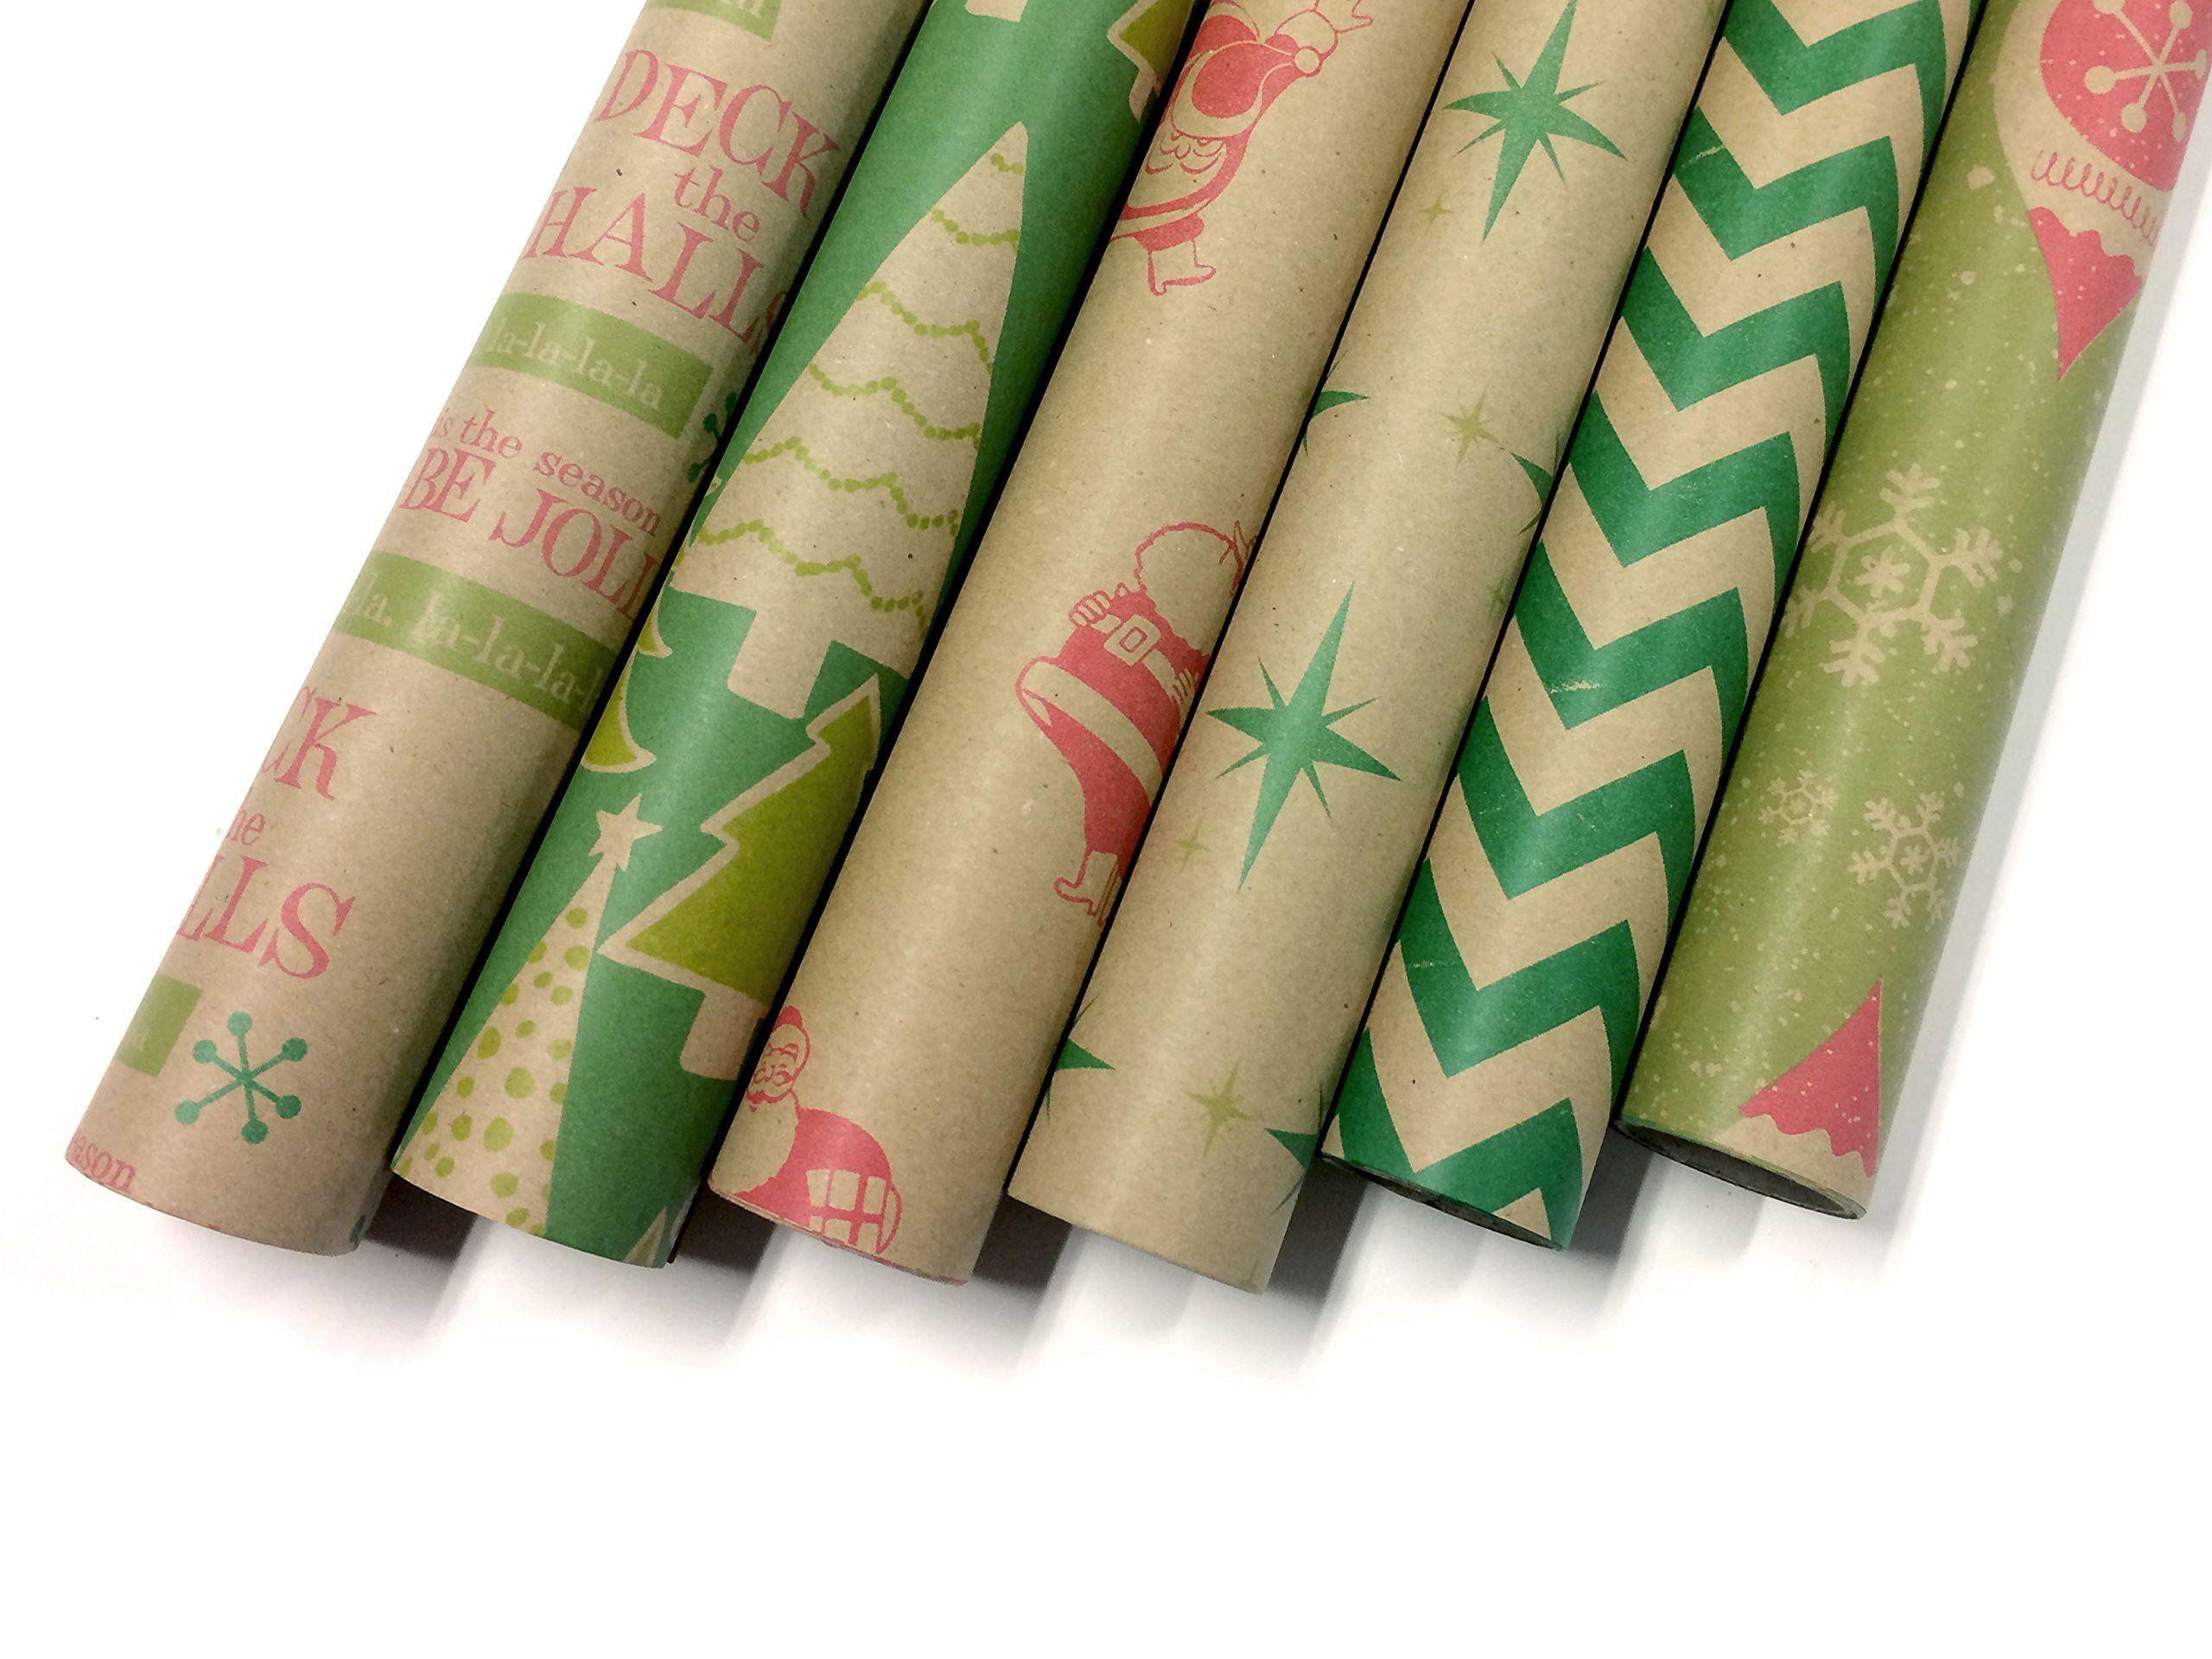 Kraft Retro Wrapping Paper Set 6 Rolls Multiple Patterns 30